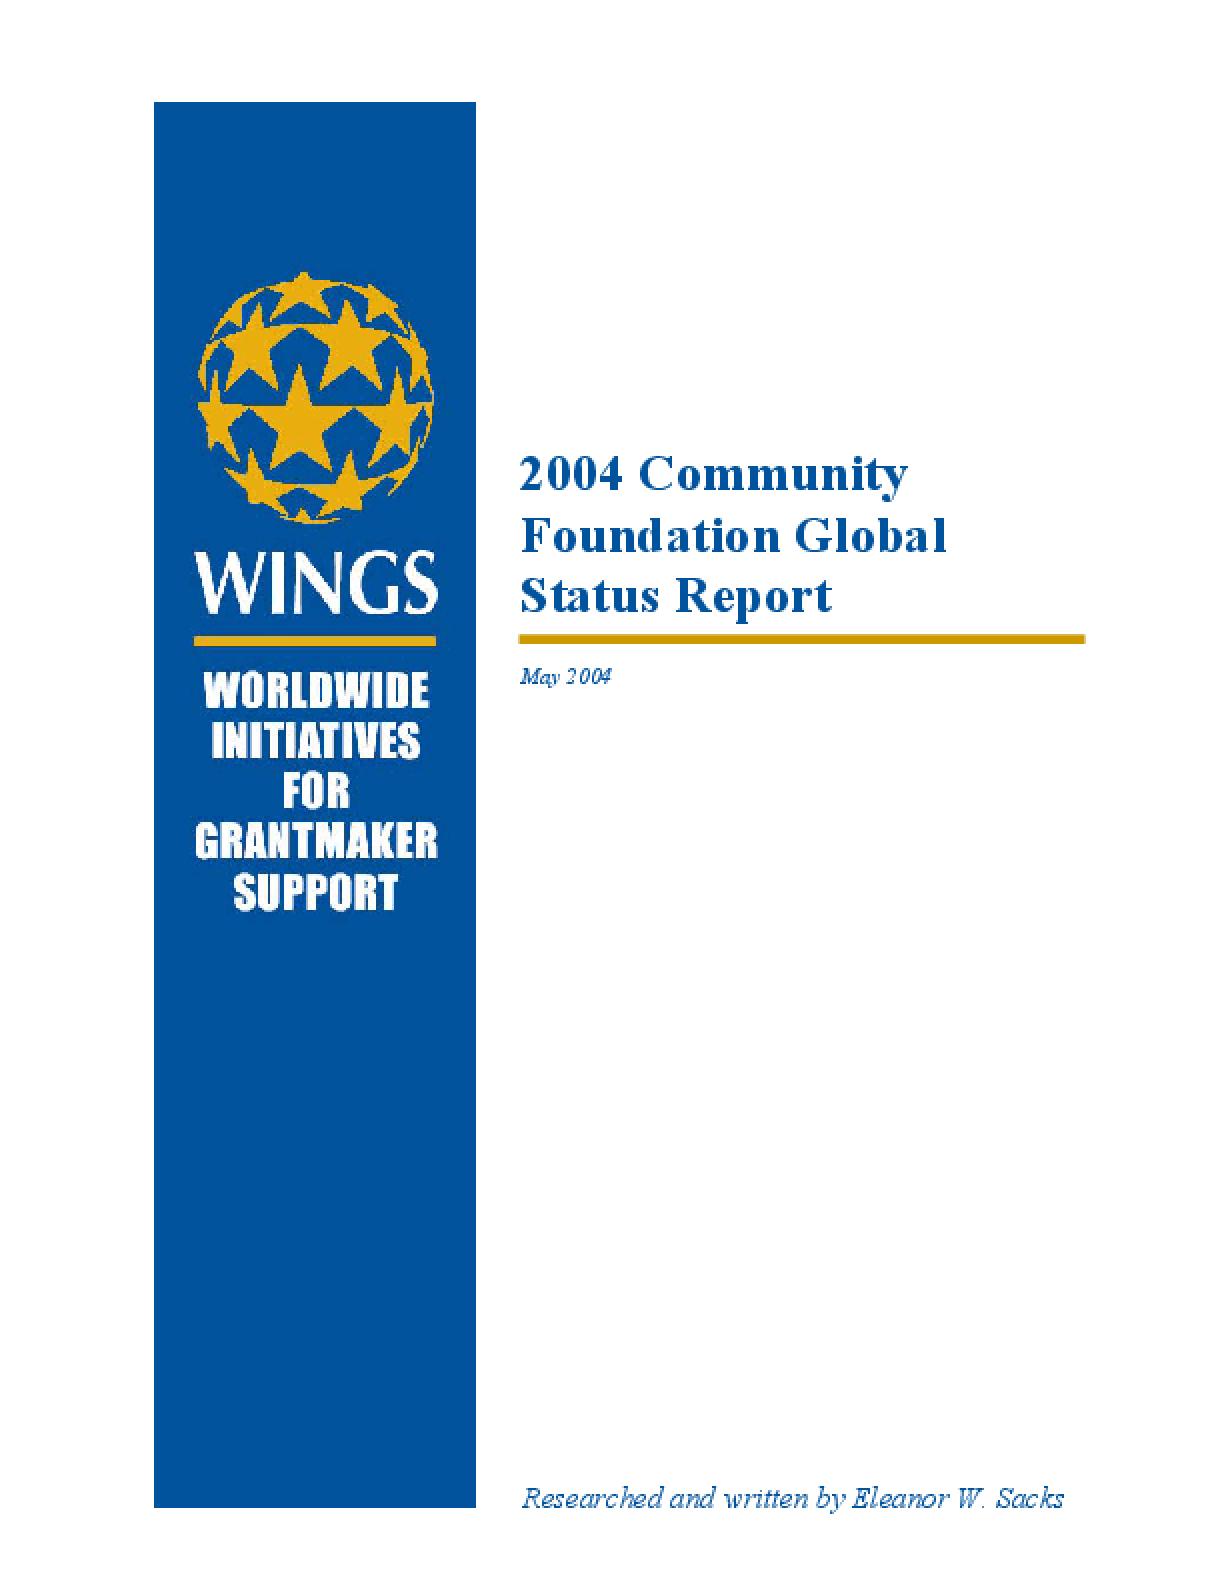 2004 Community Foundation Global Status Report